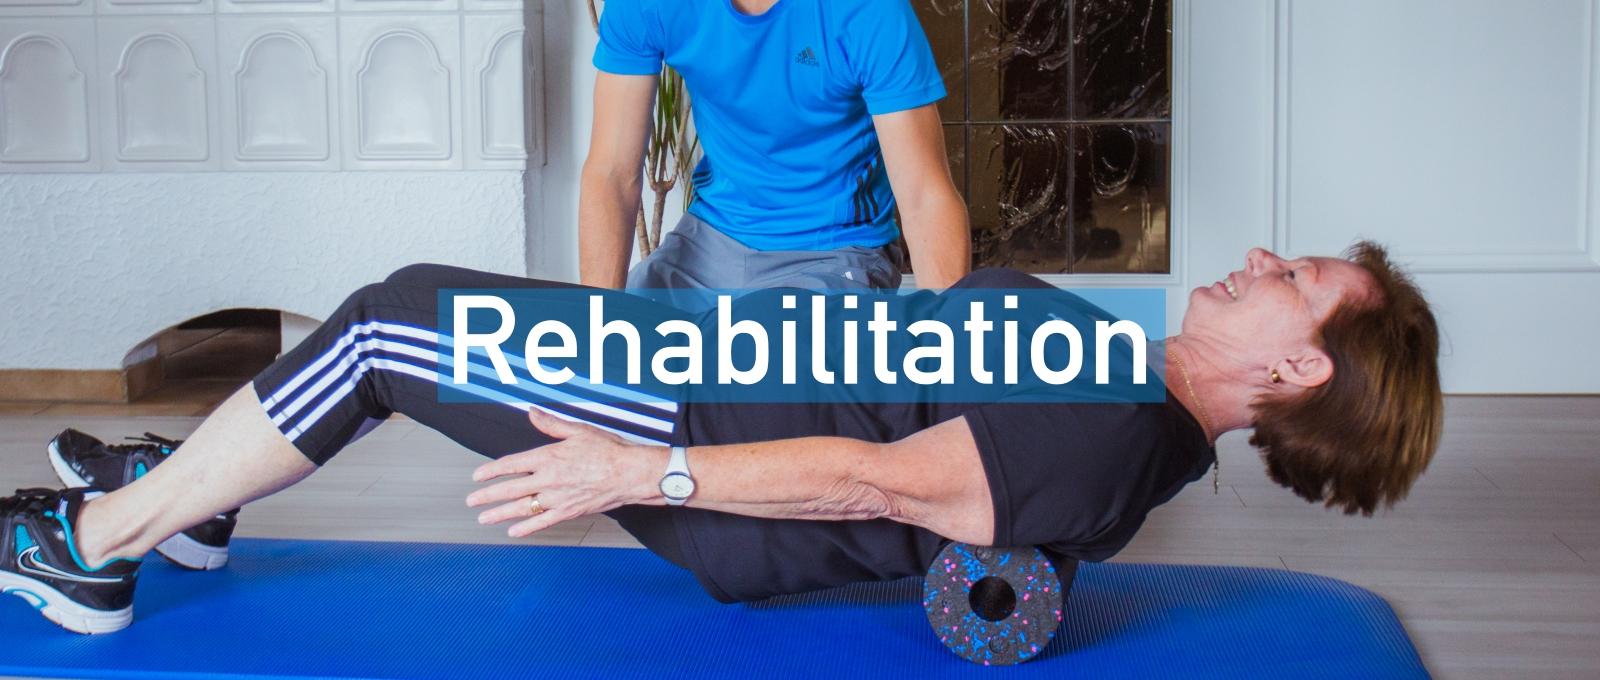 Rehabilitation.23